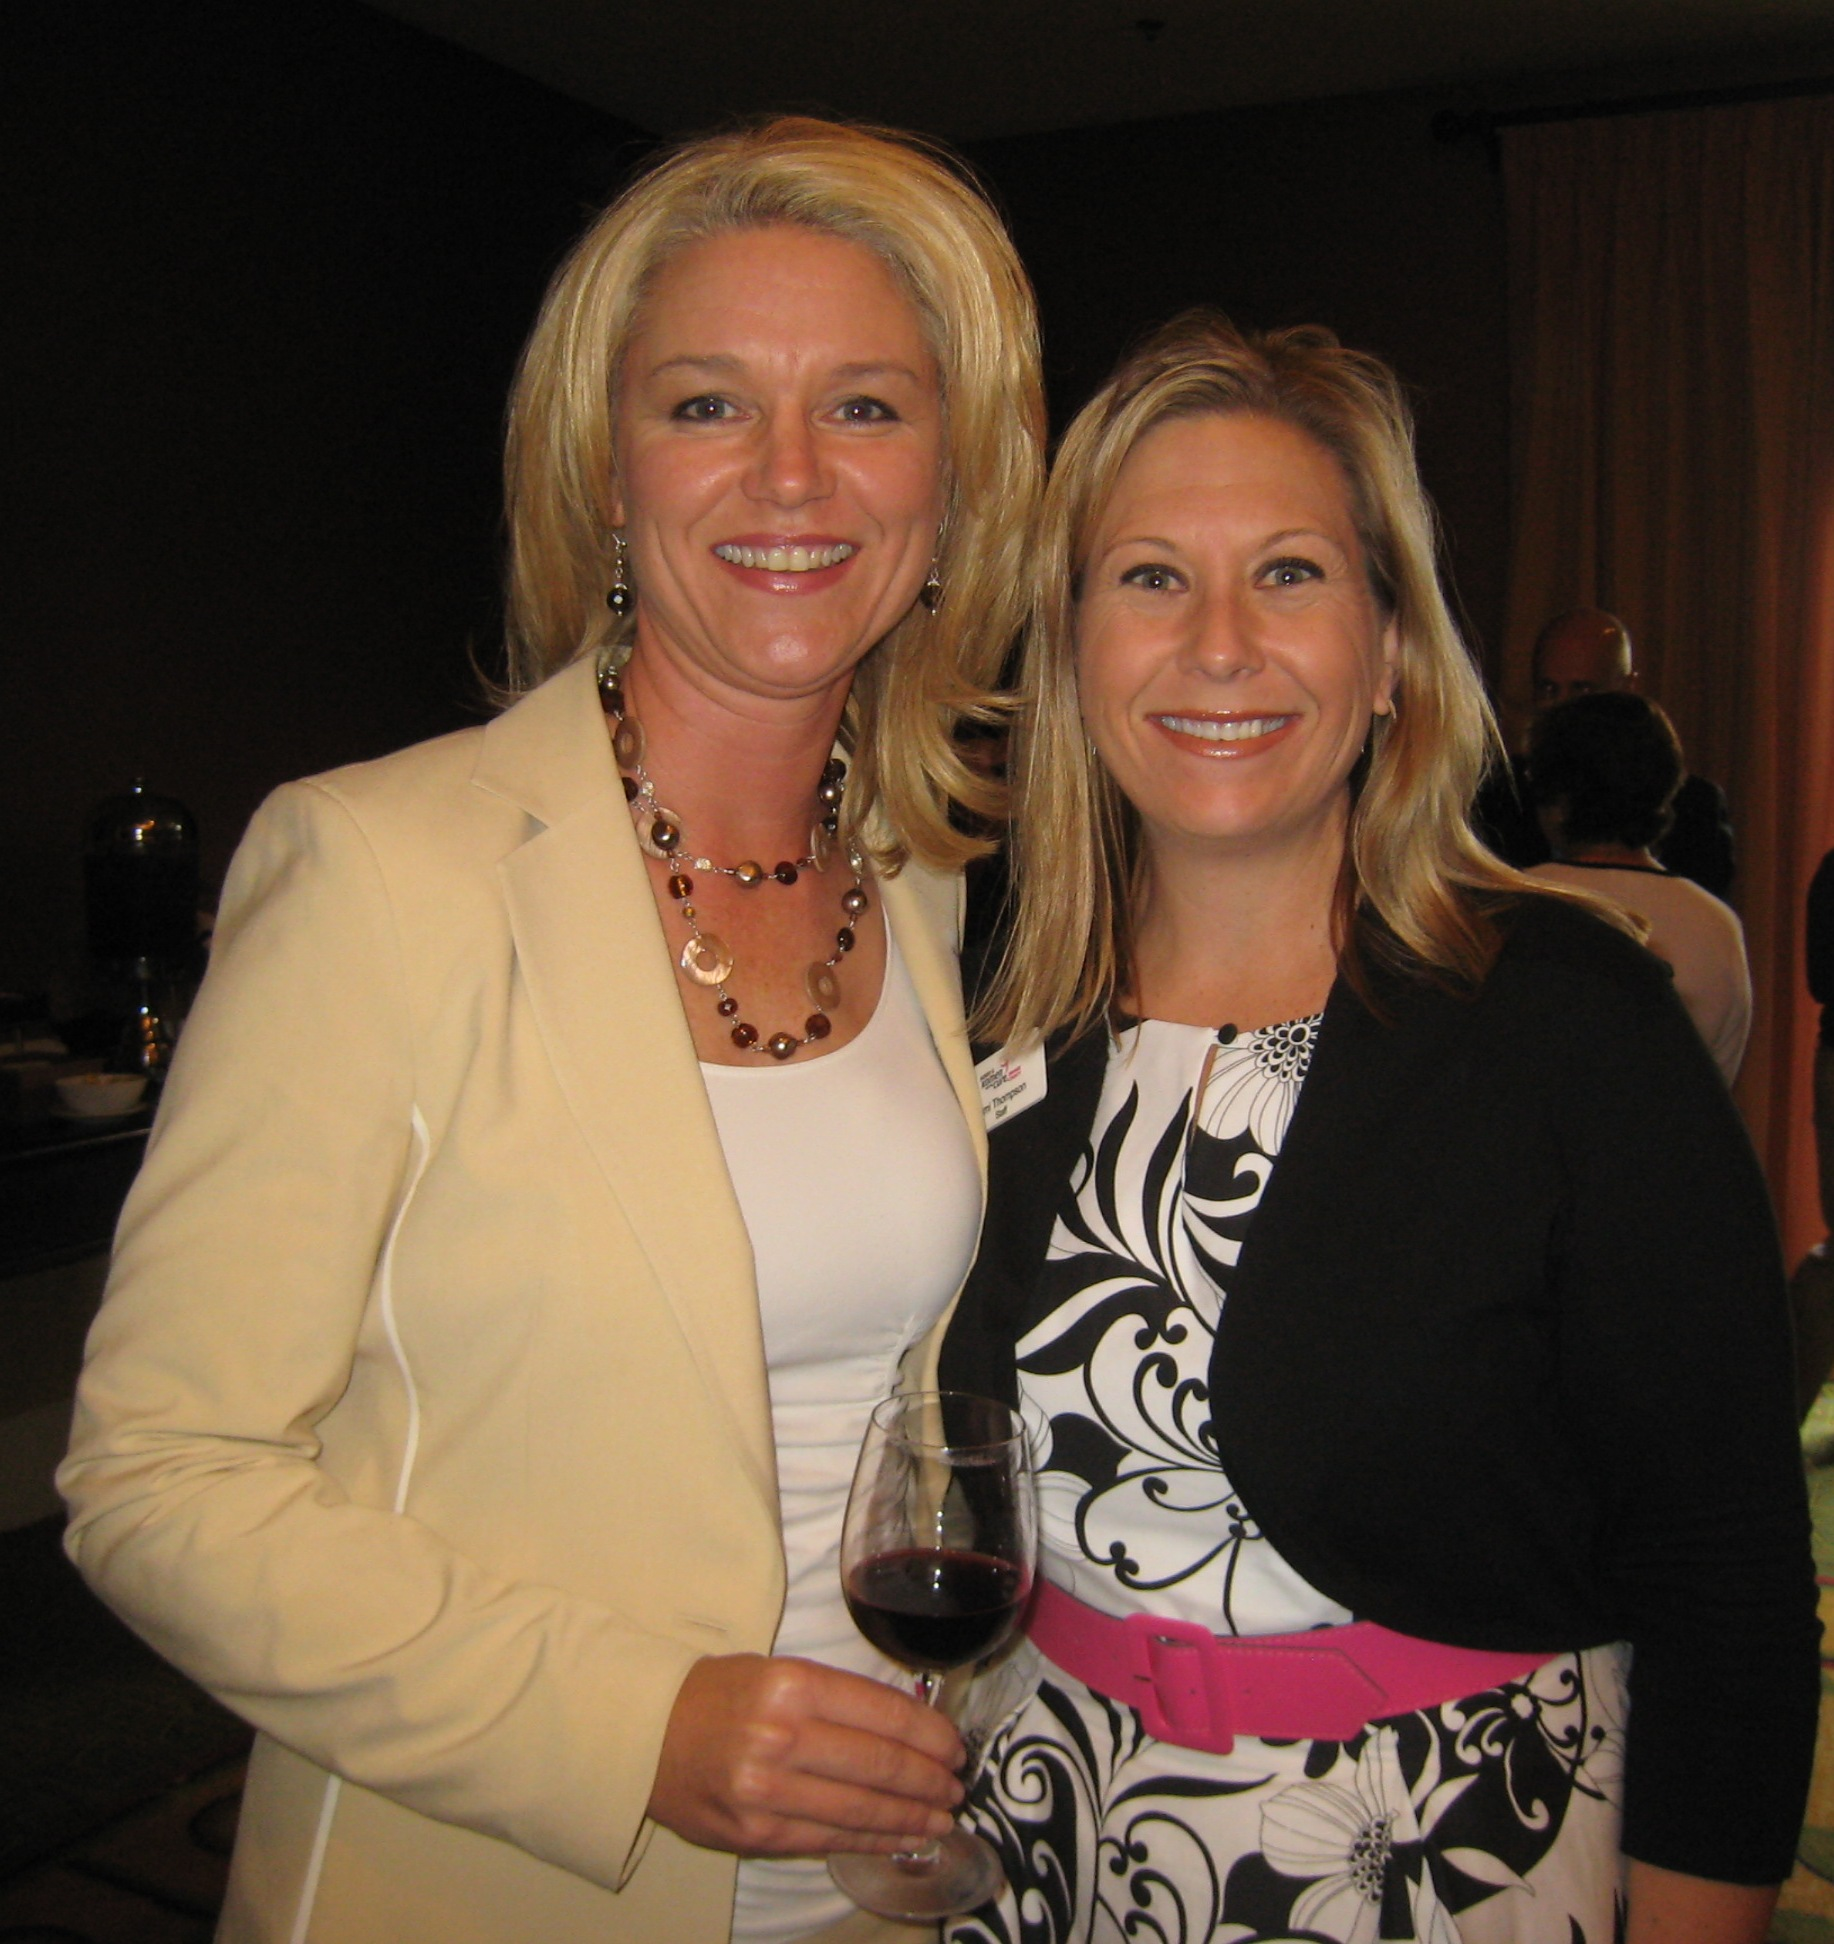 Cindy Thomsen (Left) with Tamara Thompson, Komen OC's Director of Development